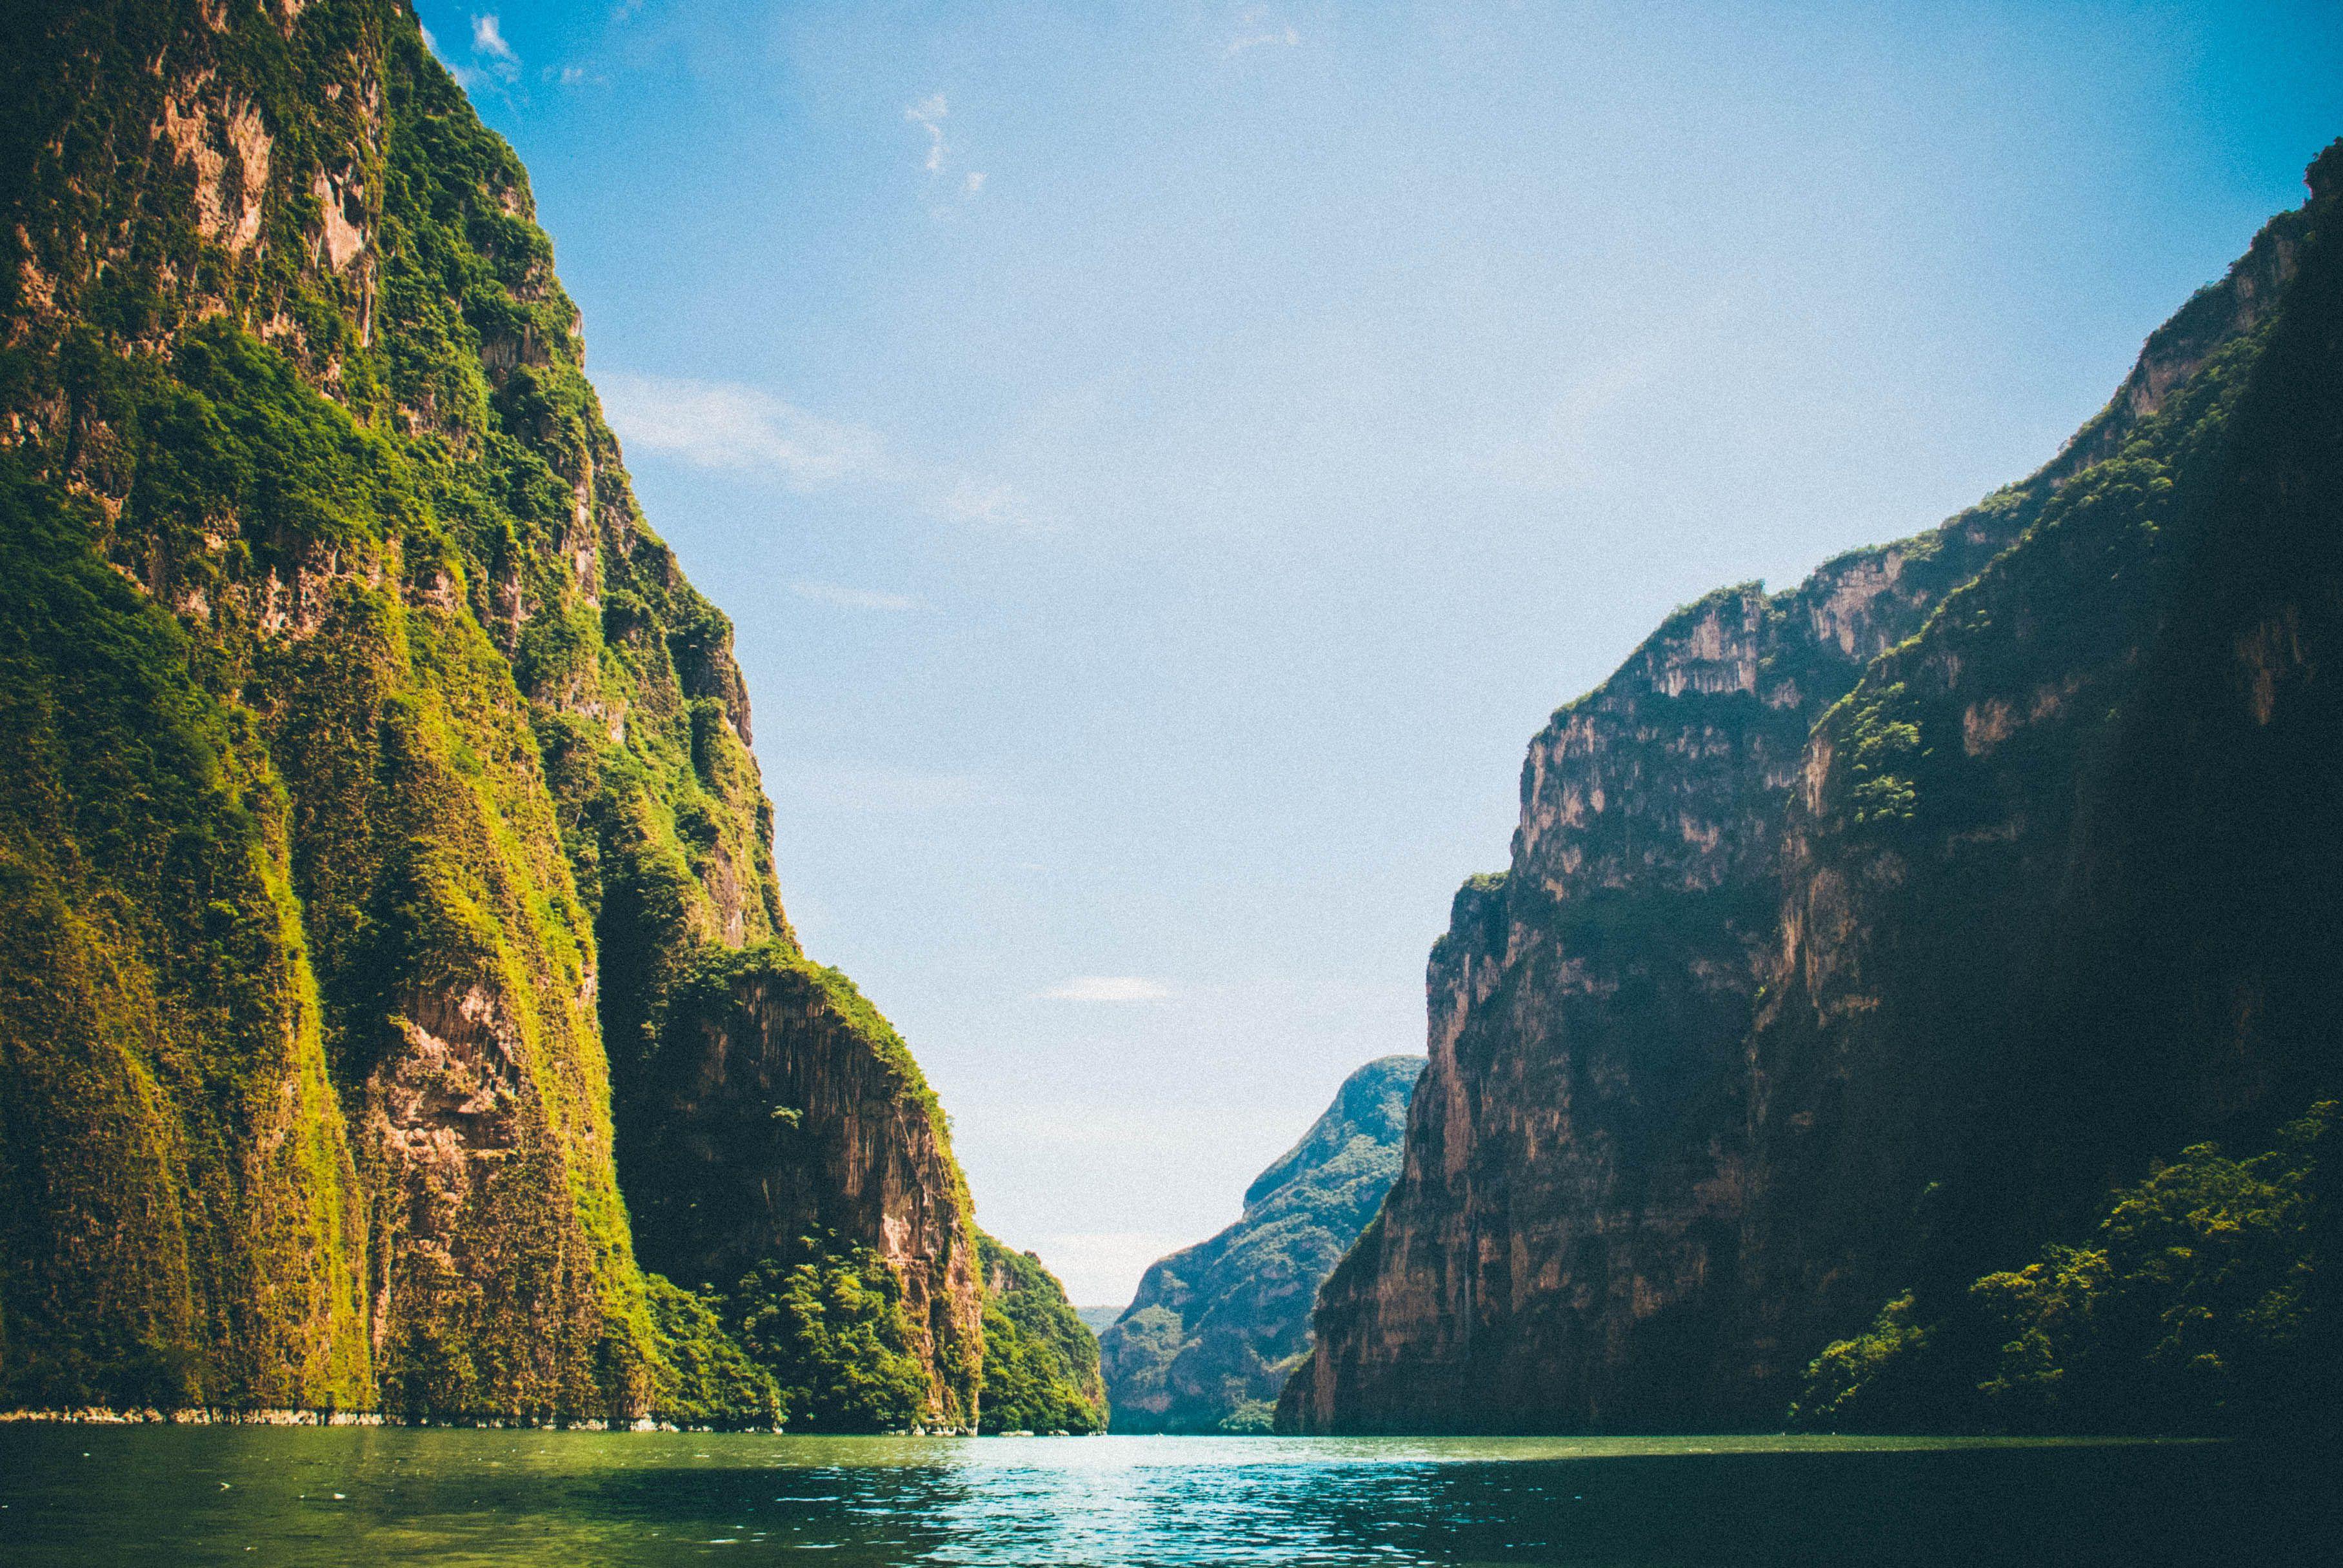 Sumidero Canyon, Mexico